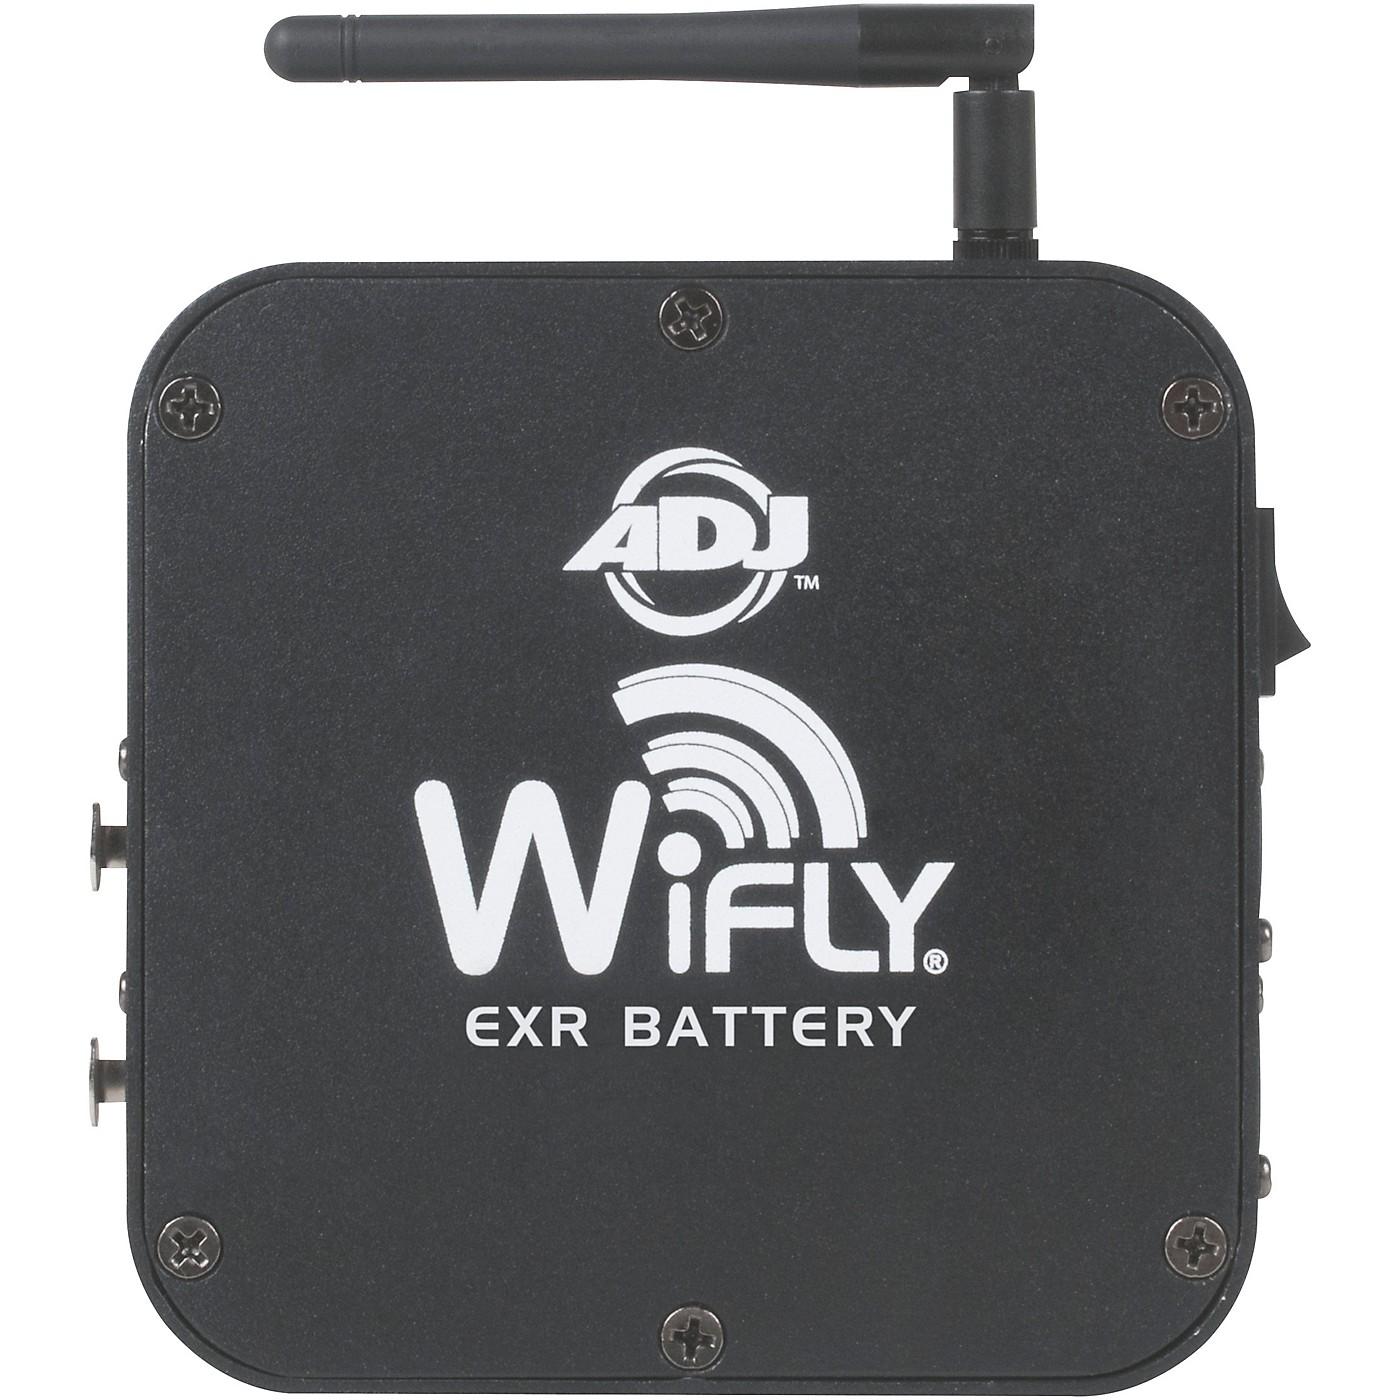 21st Century Publications Wifly EXR Battery DMX Transceiver thumbnail